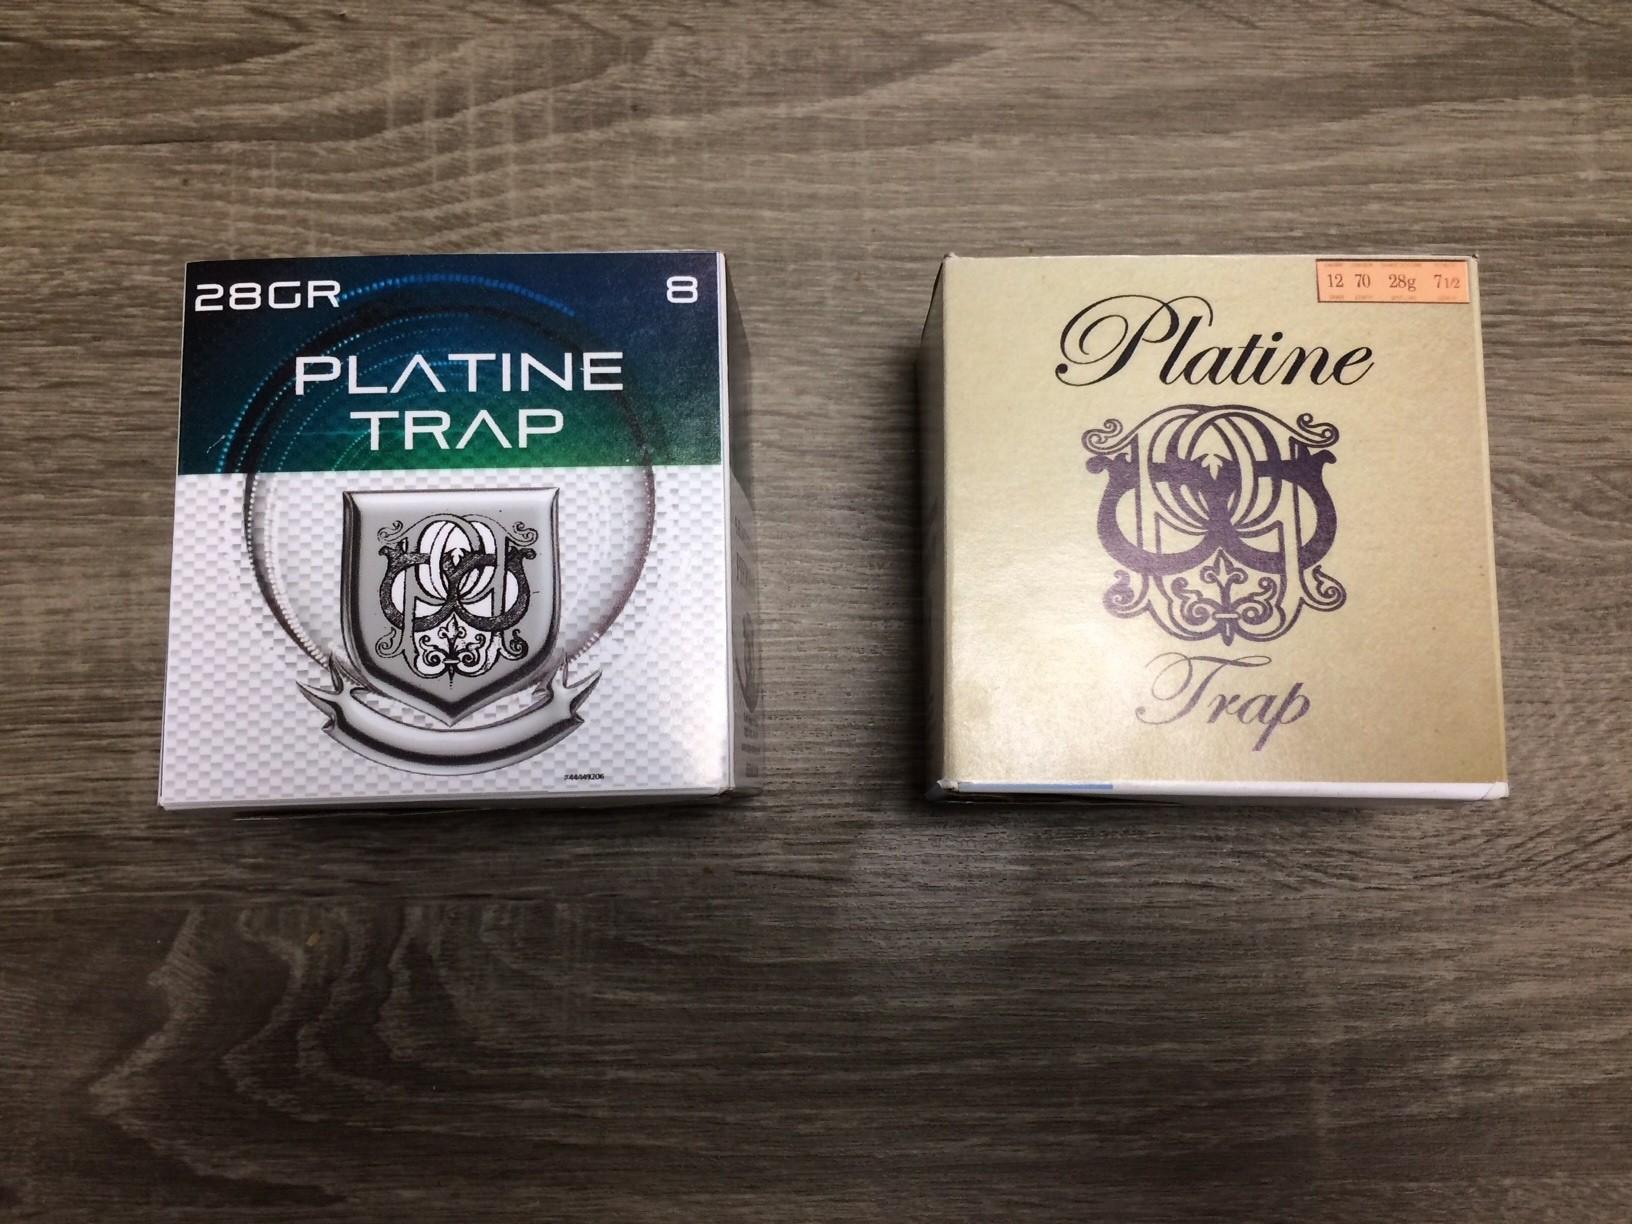 Platine Trap